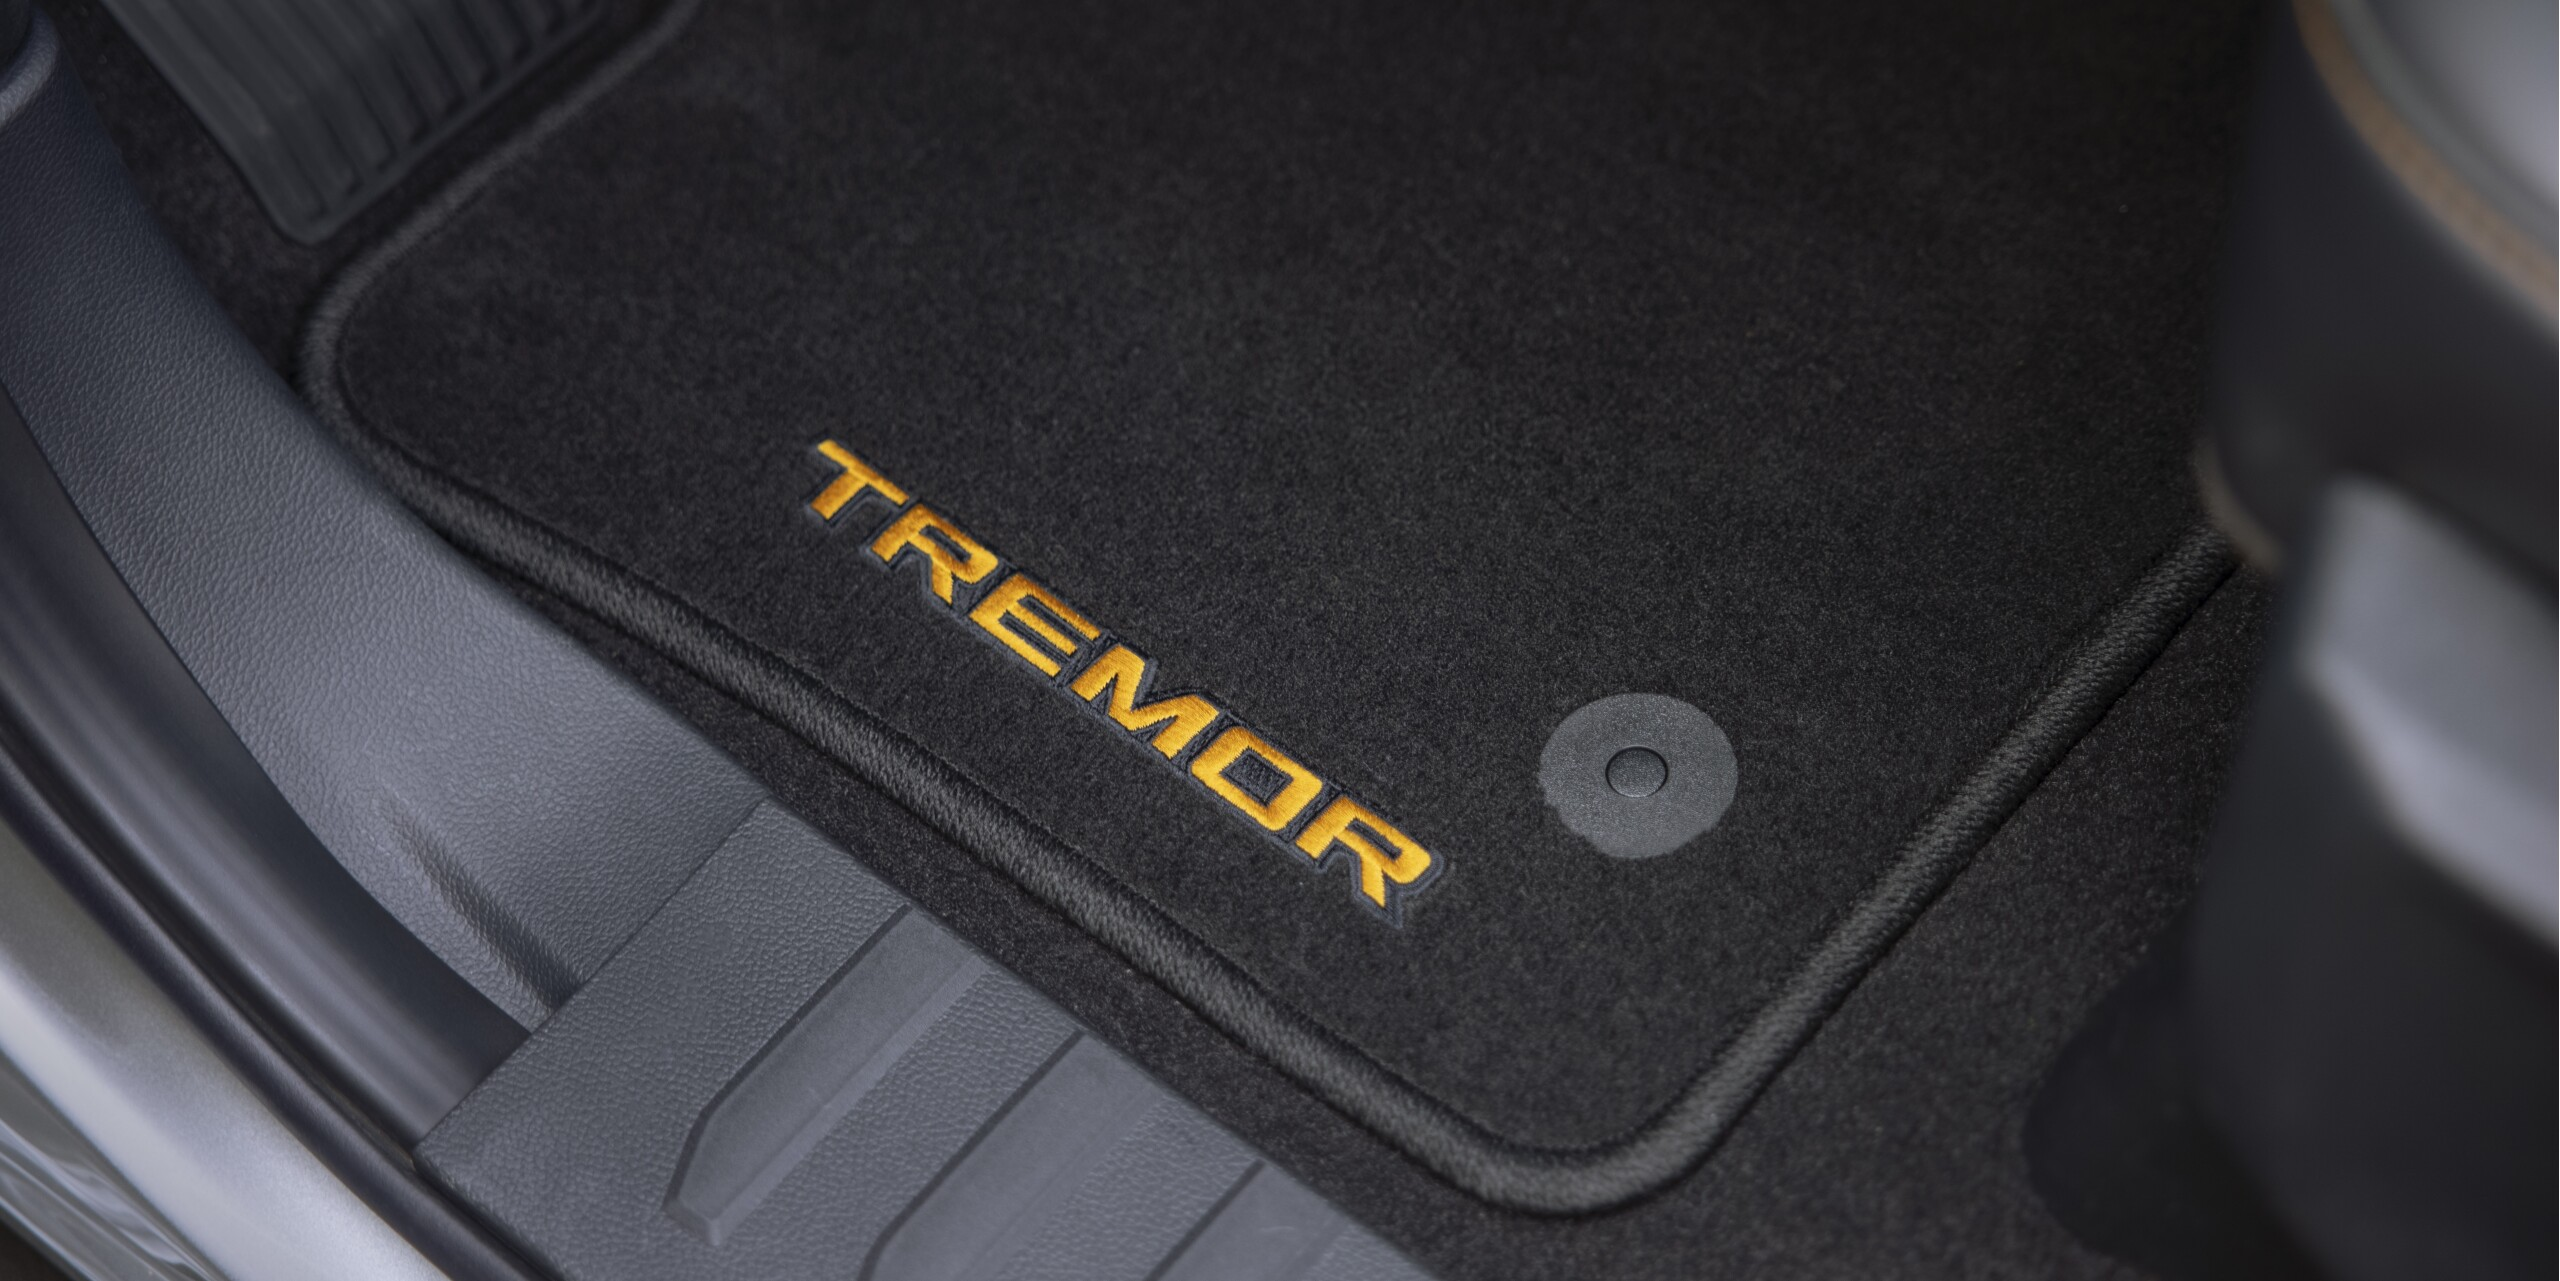 2021 Ford F-150 Tremor_23.jpg